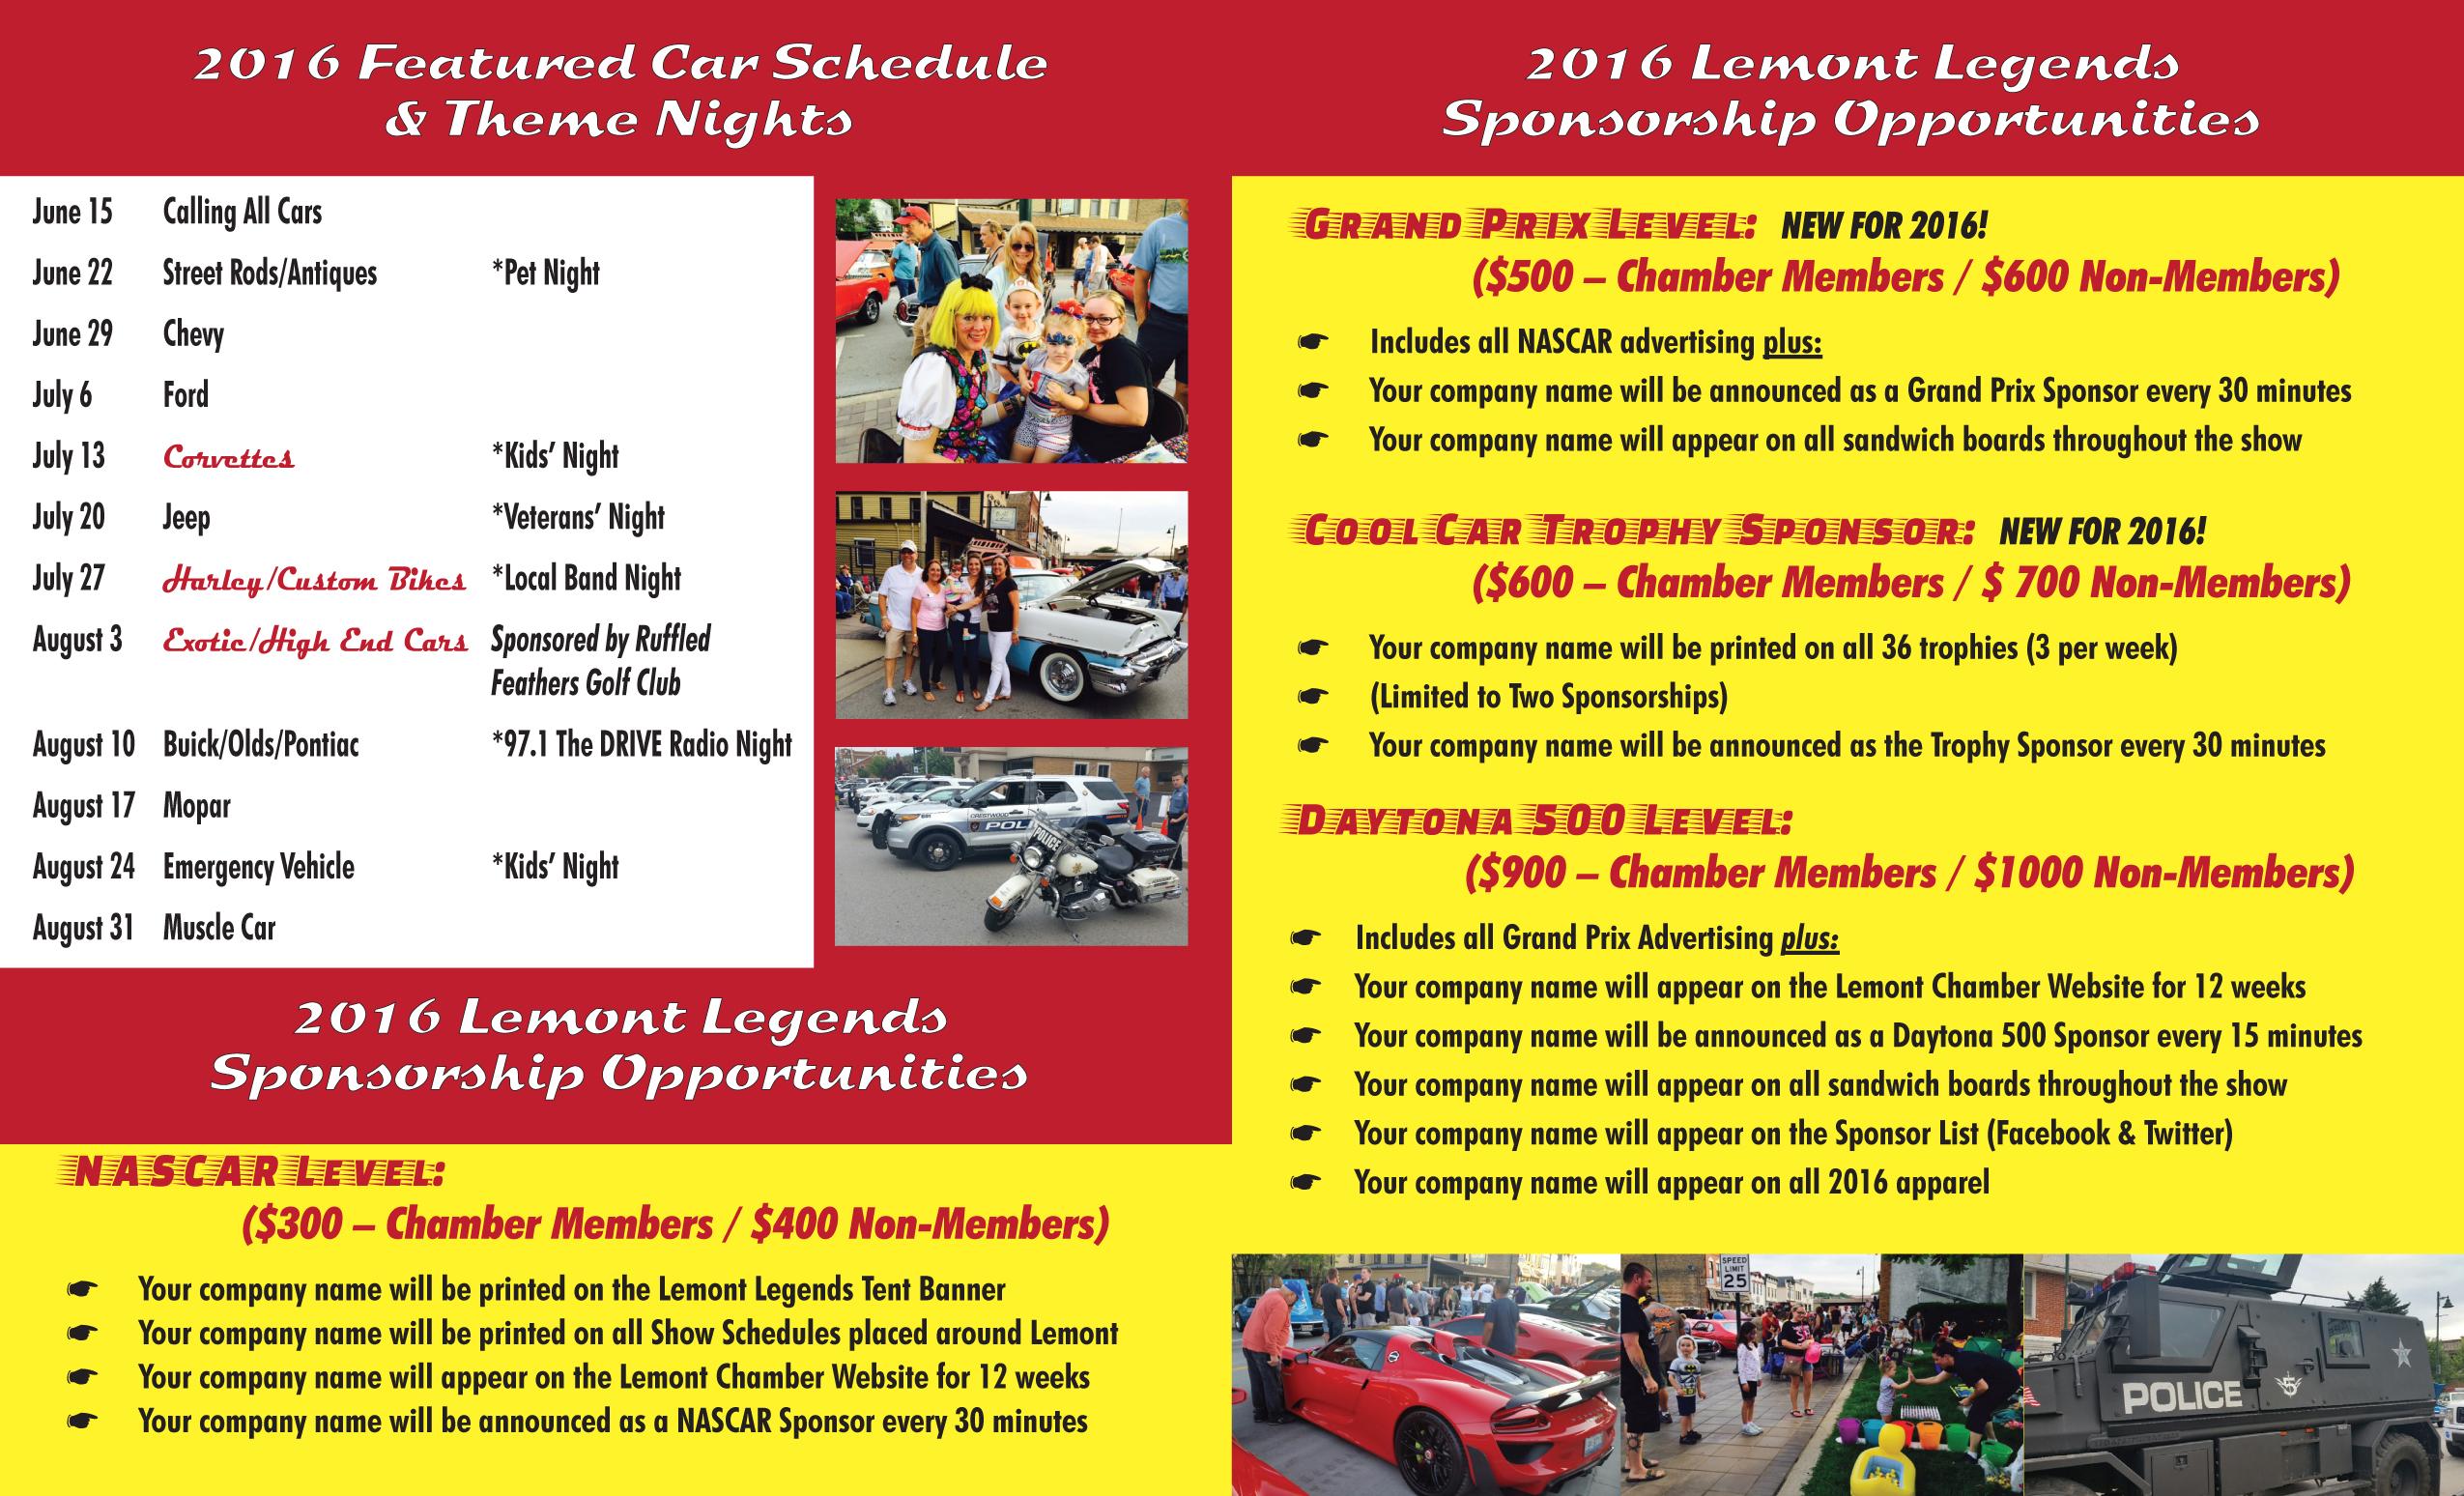 Lemont_Legends_2016_Sponship_Brochure_Print_Inside-w2100.jpg